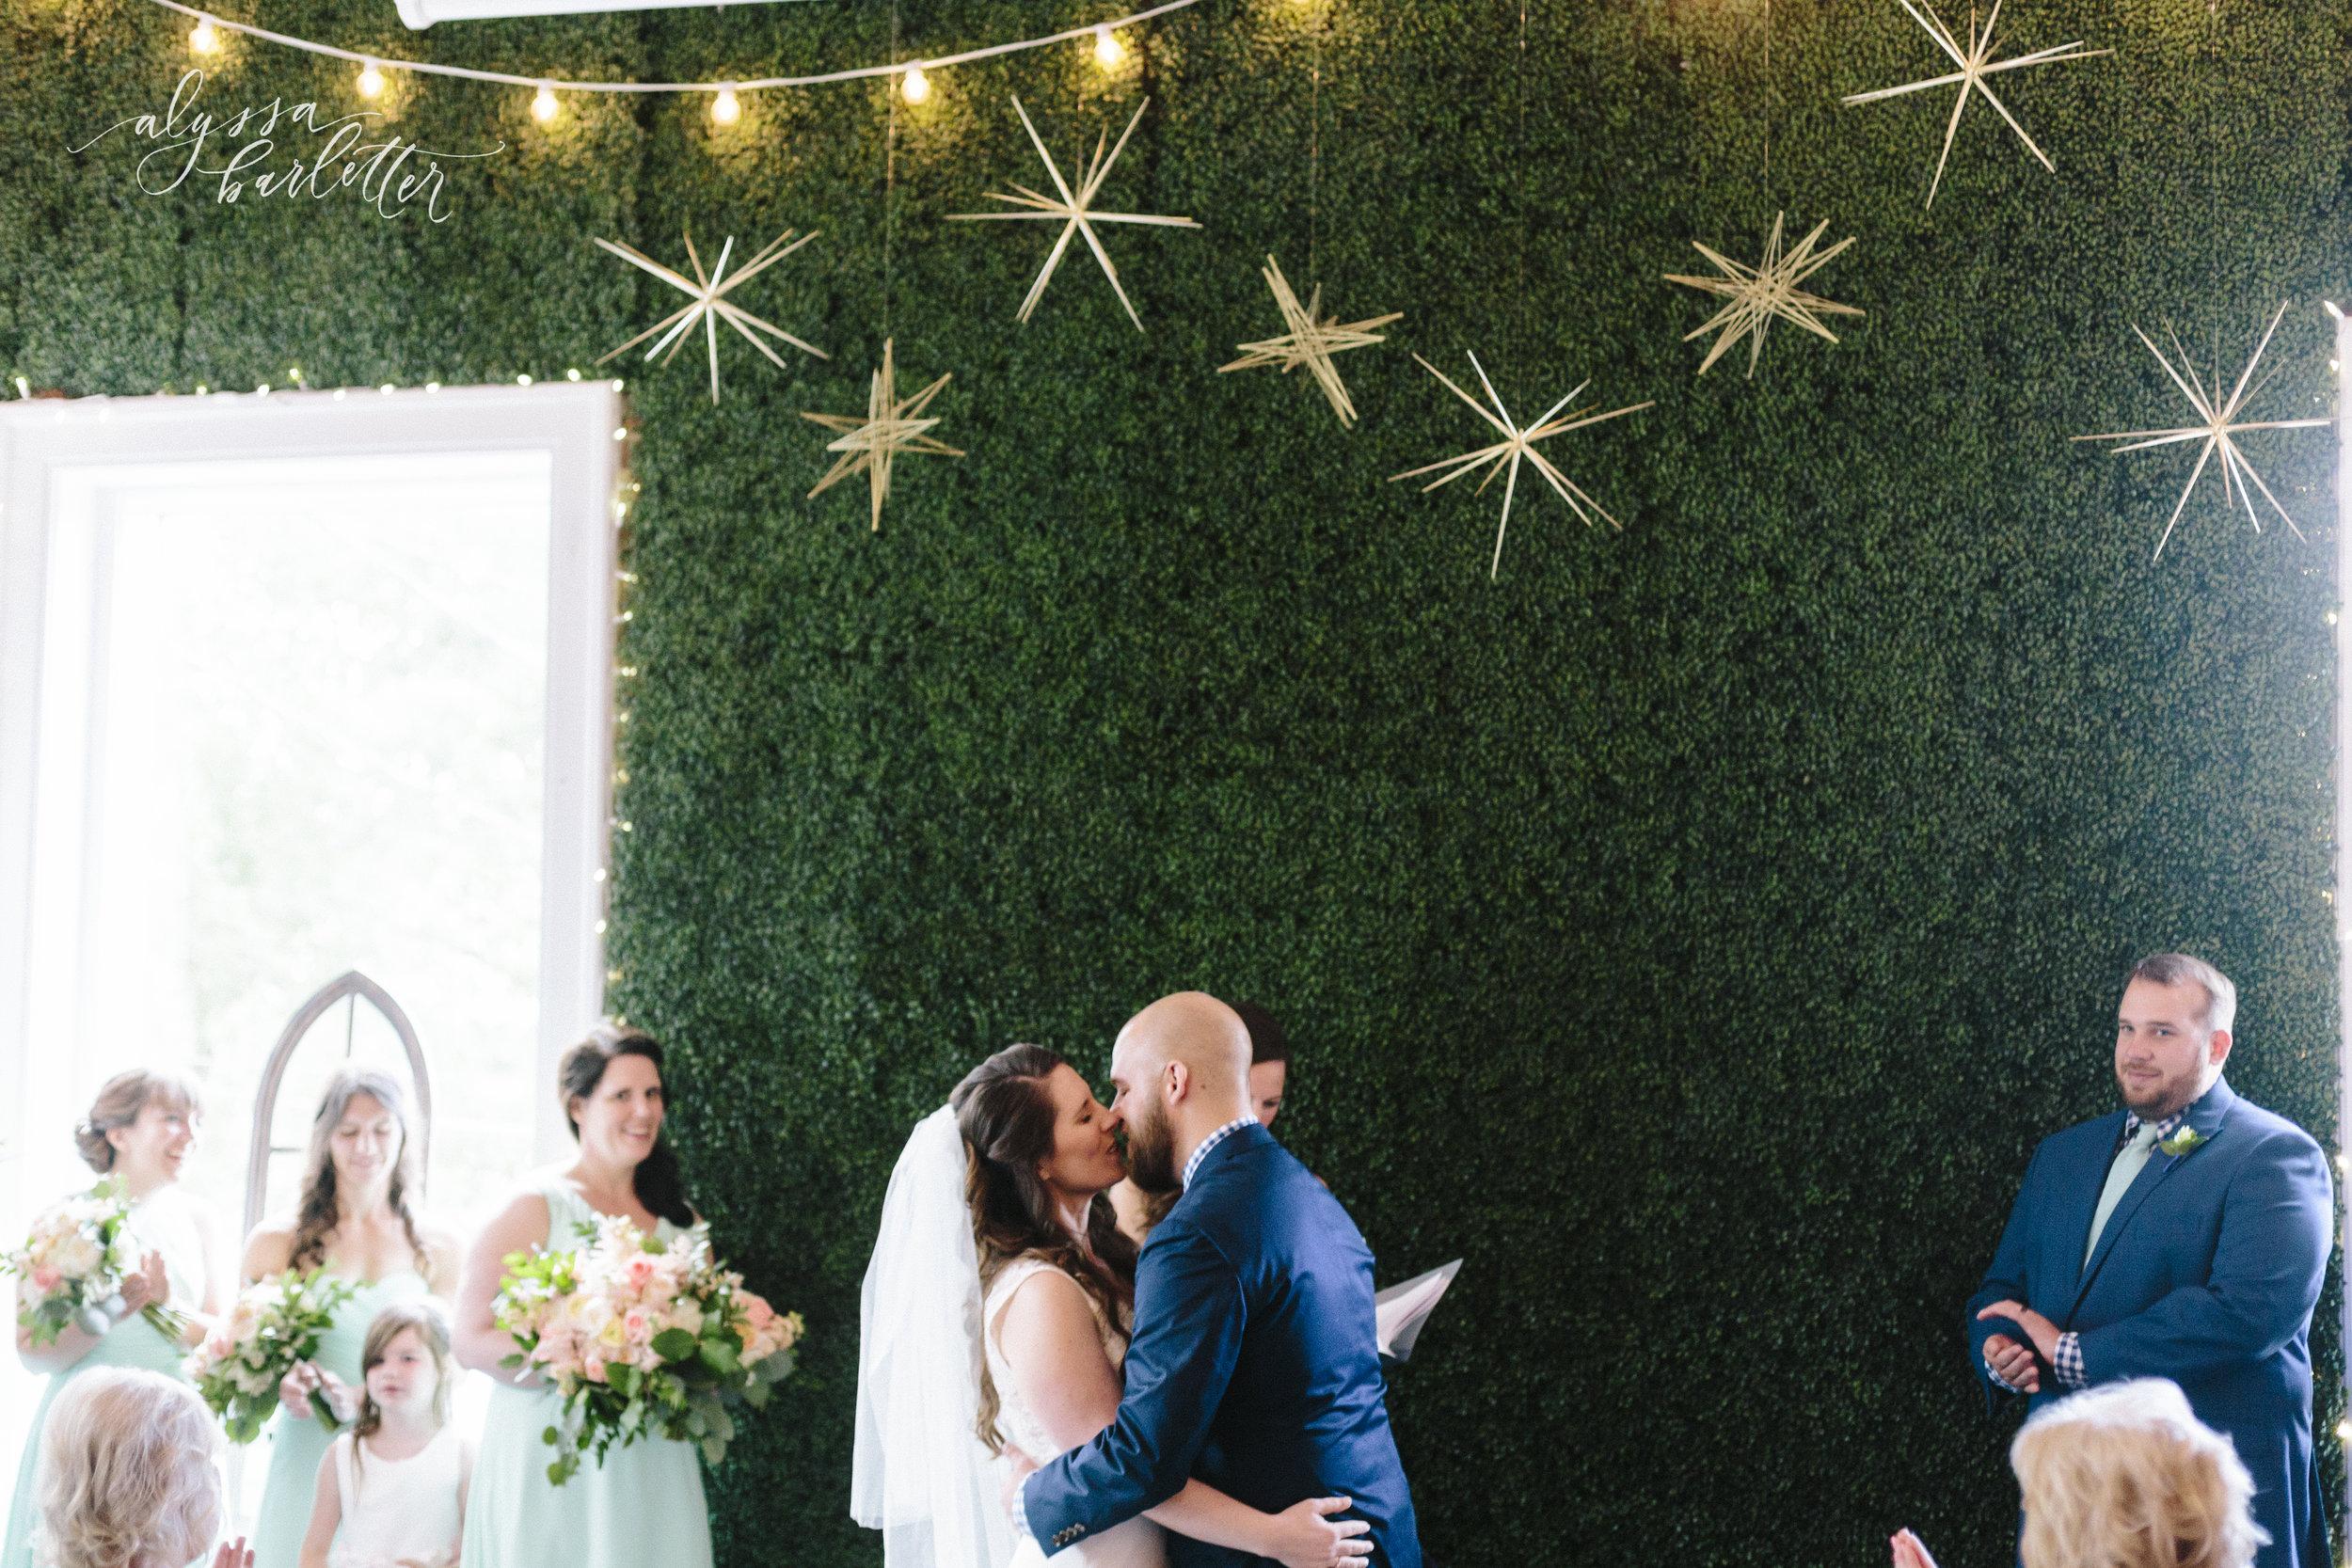 alyssa barletter photography kansas city wedding 2016 main courtney and brian-1-20.jpg